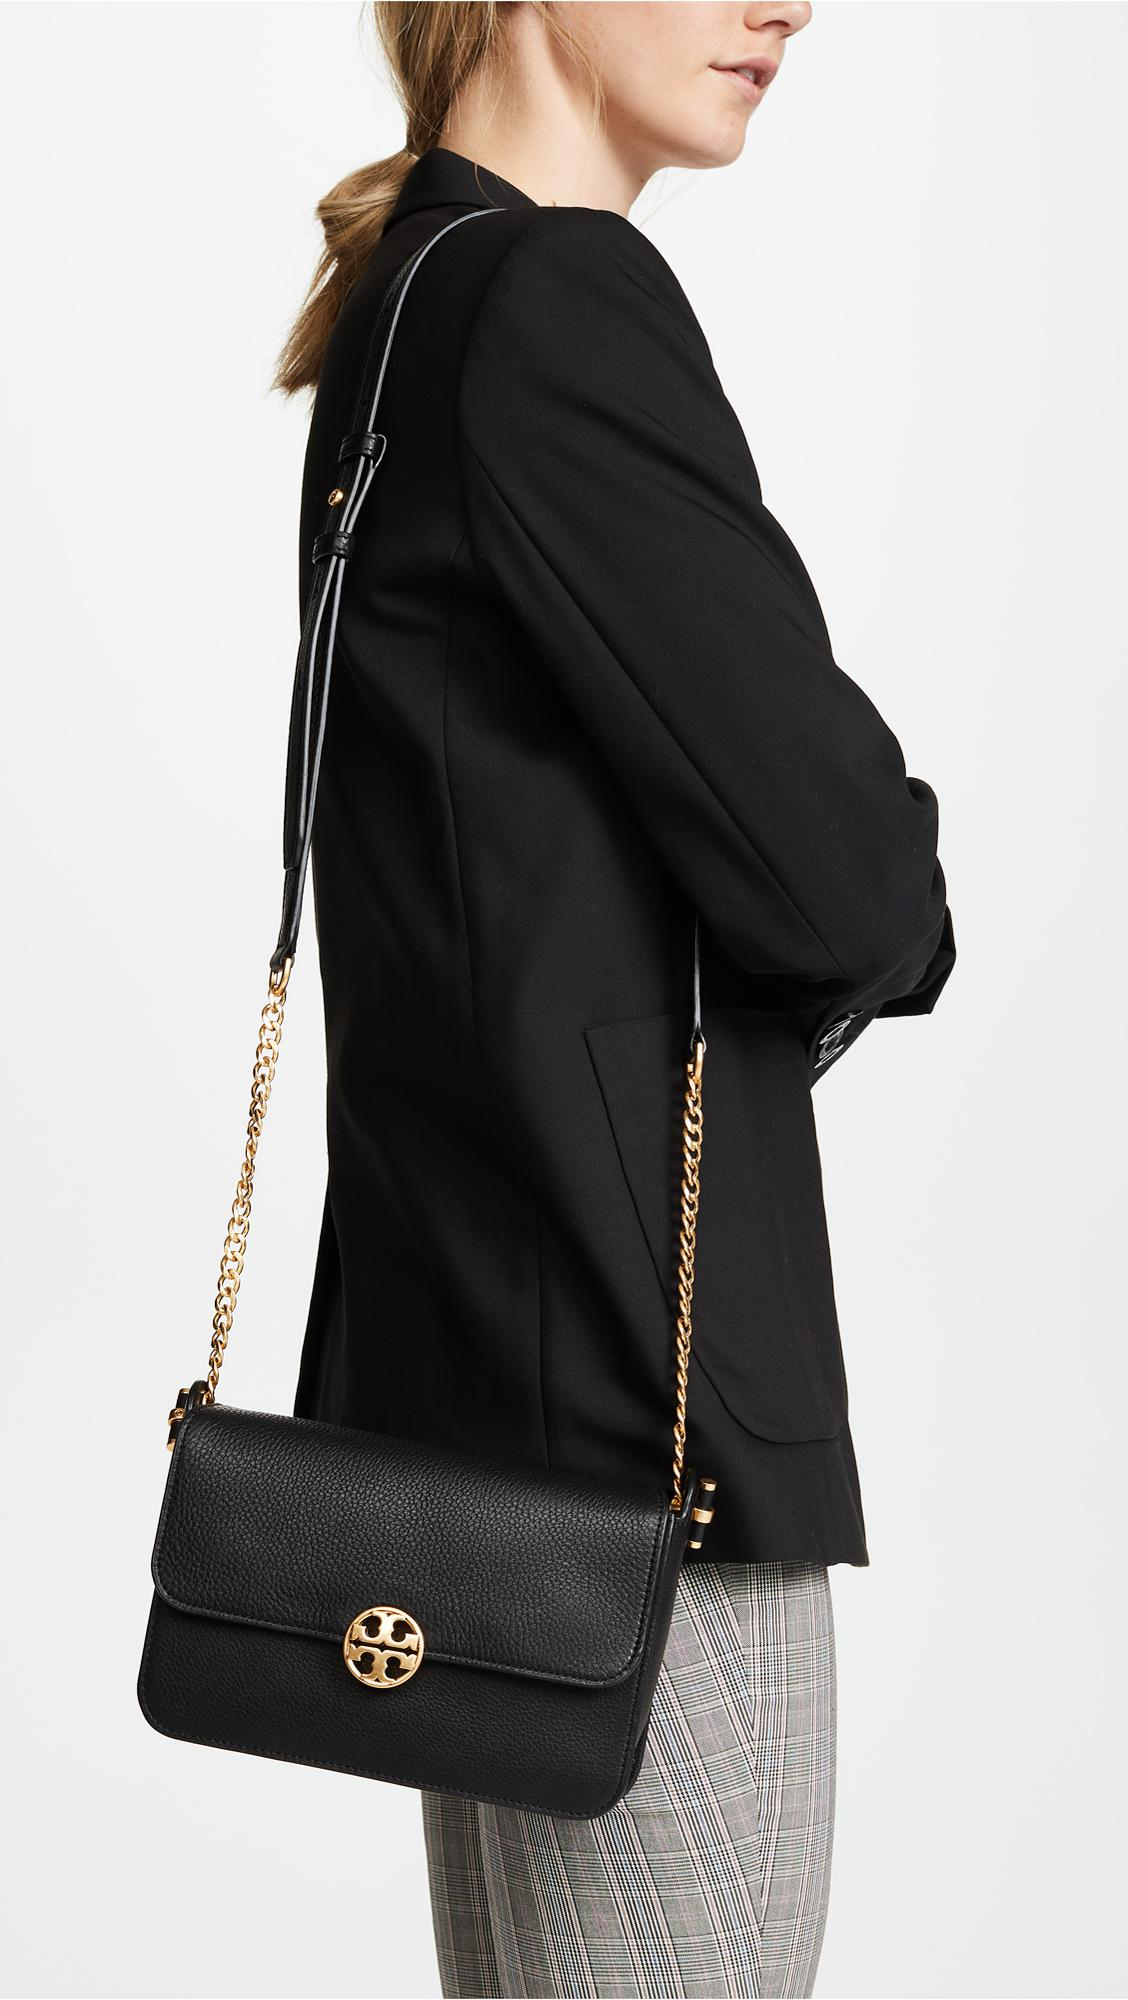 4ff24ccad1 Lyst - Tory Burch Chelsea Cross Body Bag in Black